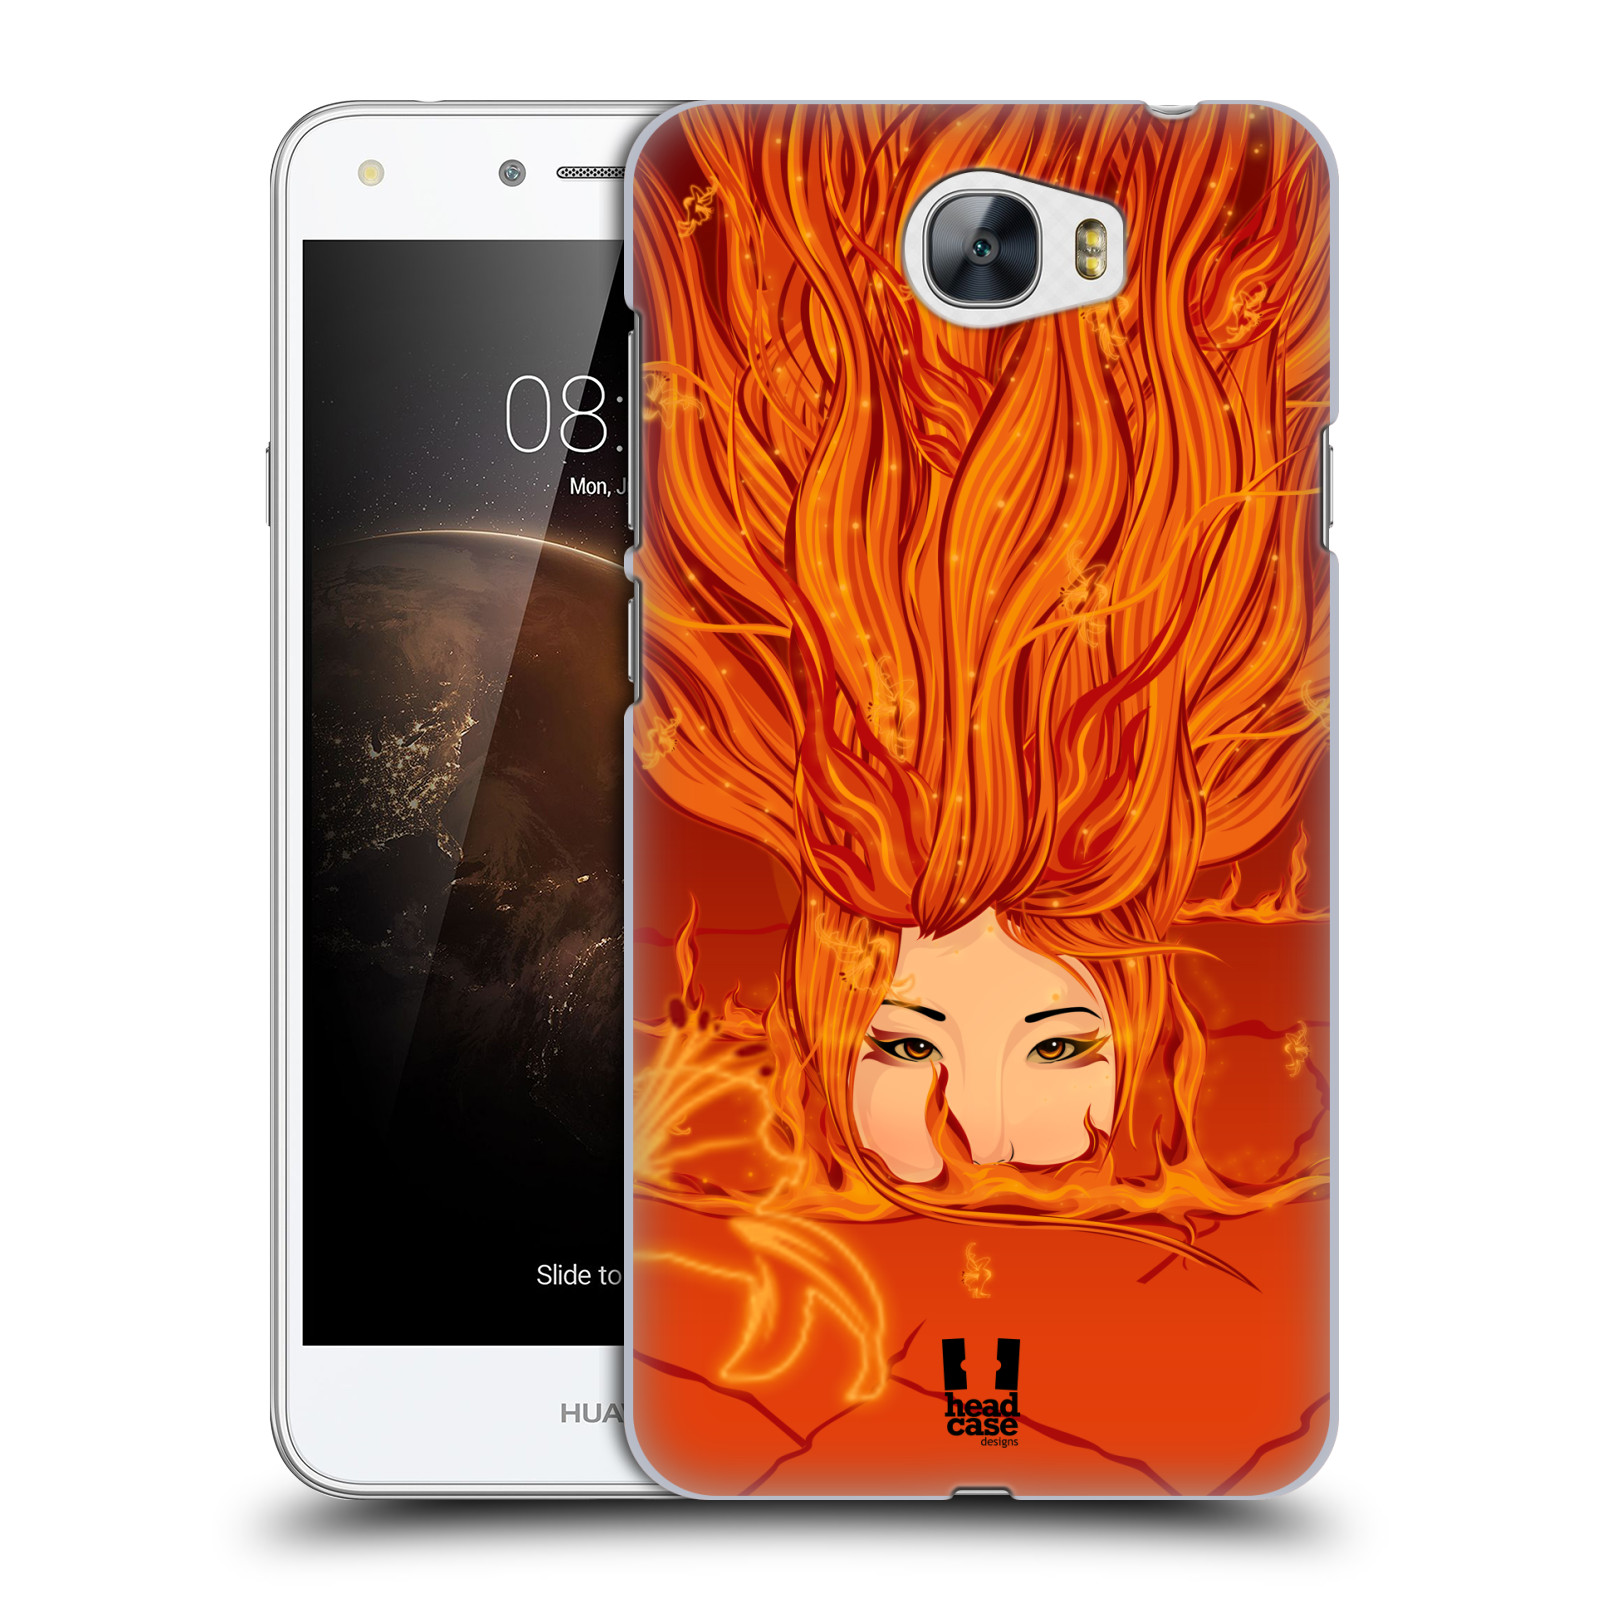 HEAD CASE plastový obal na mobil Huawei Y6 II Compact vzor Žena element OHEŇ oranžová